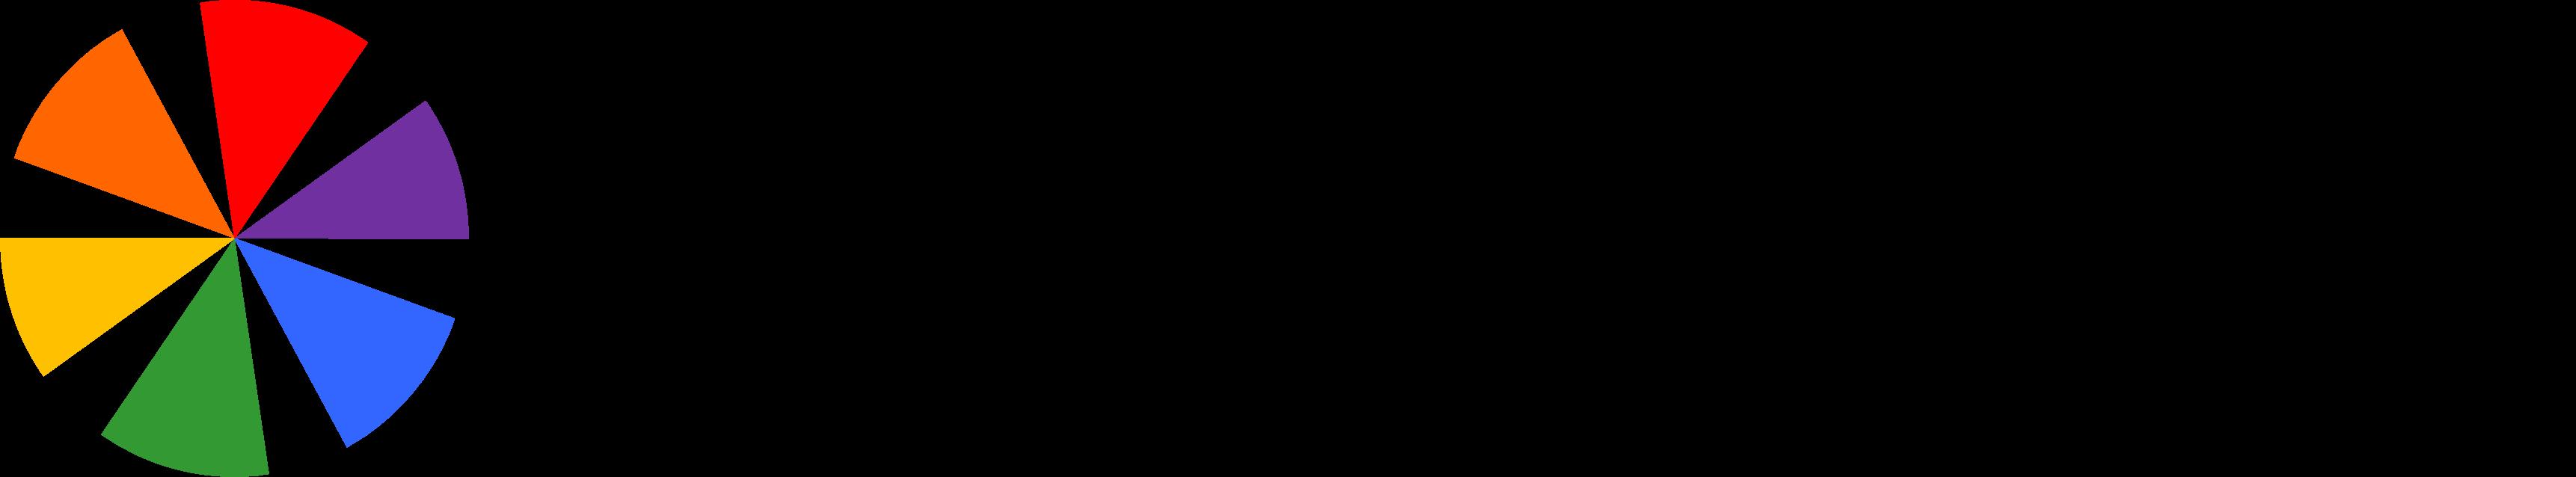 Treet Television Network